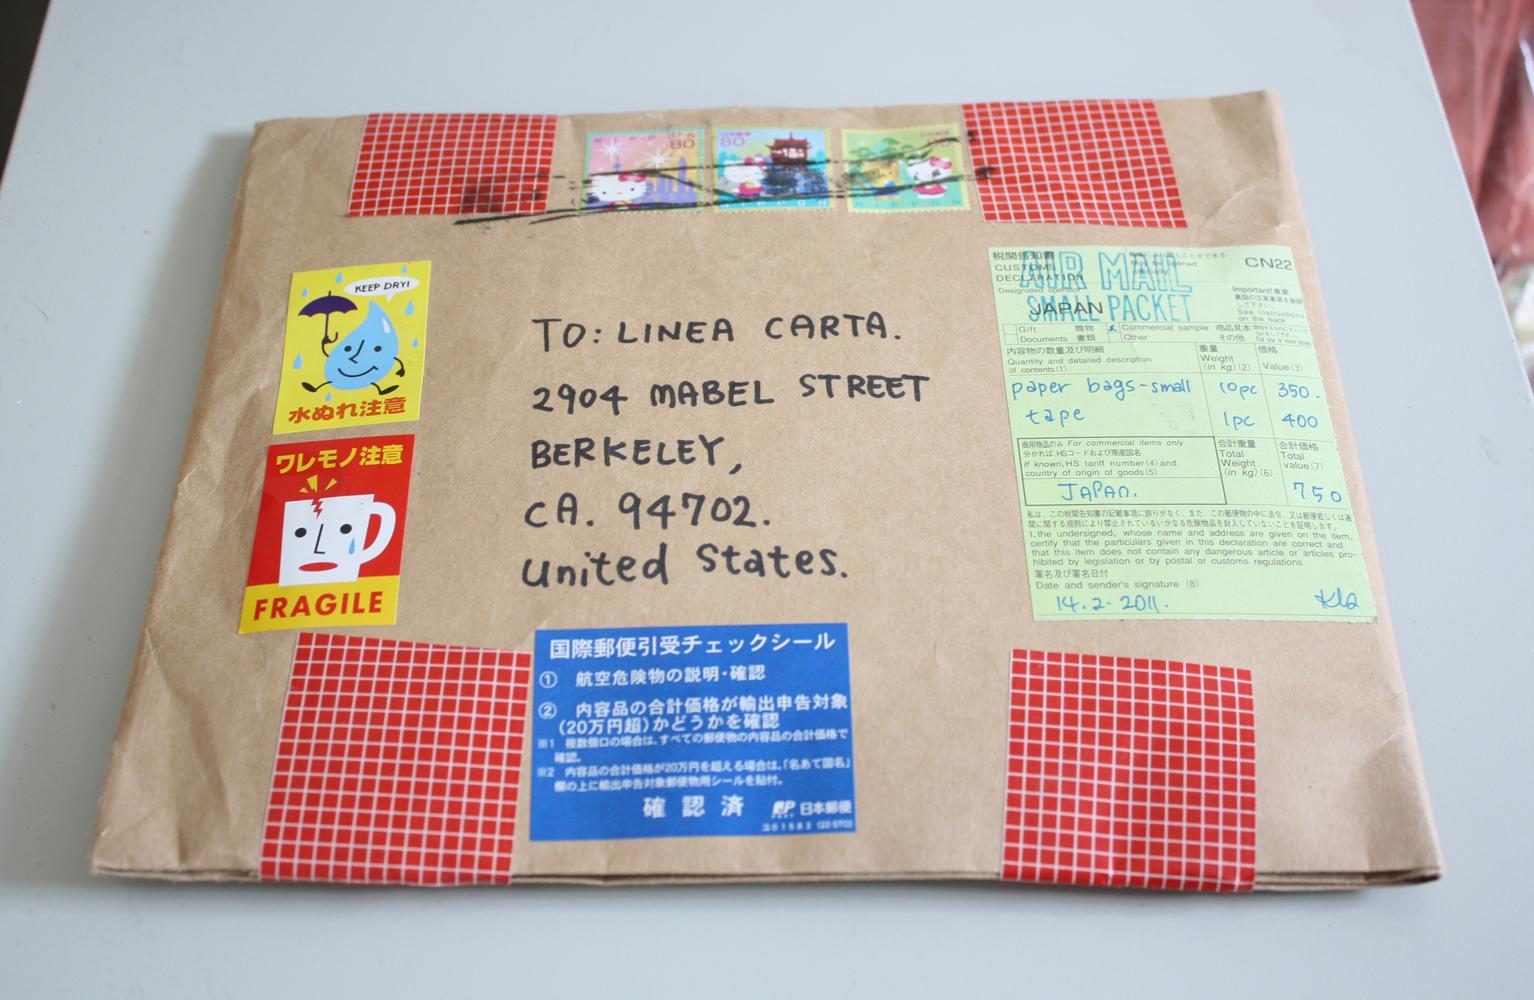 Linea carta packaging japan part 4 for Linea carta canape plates